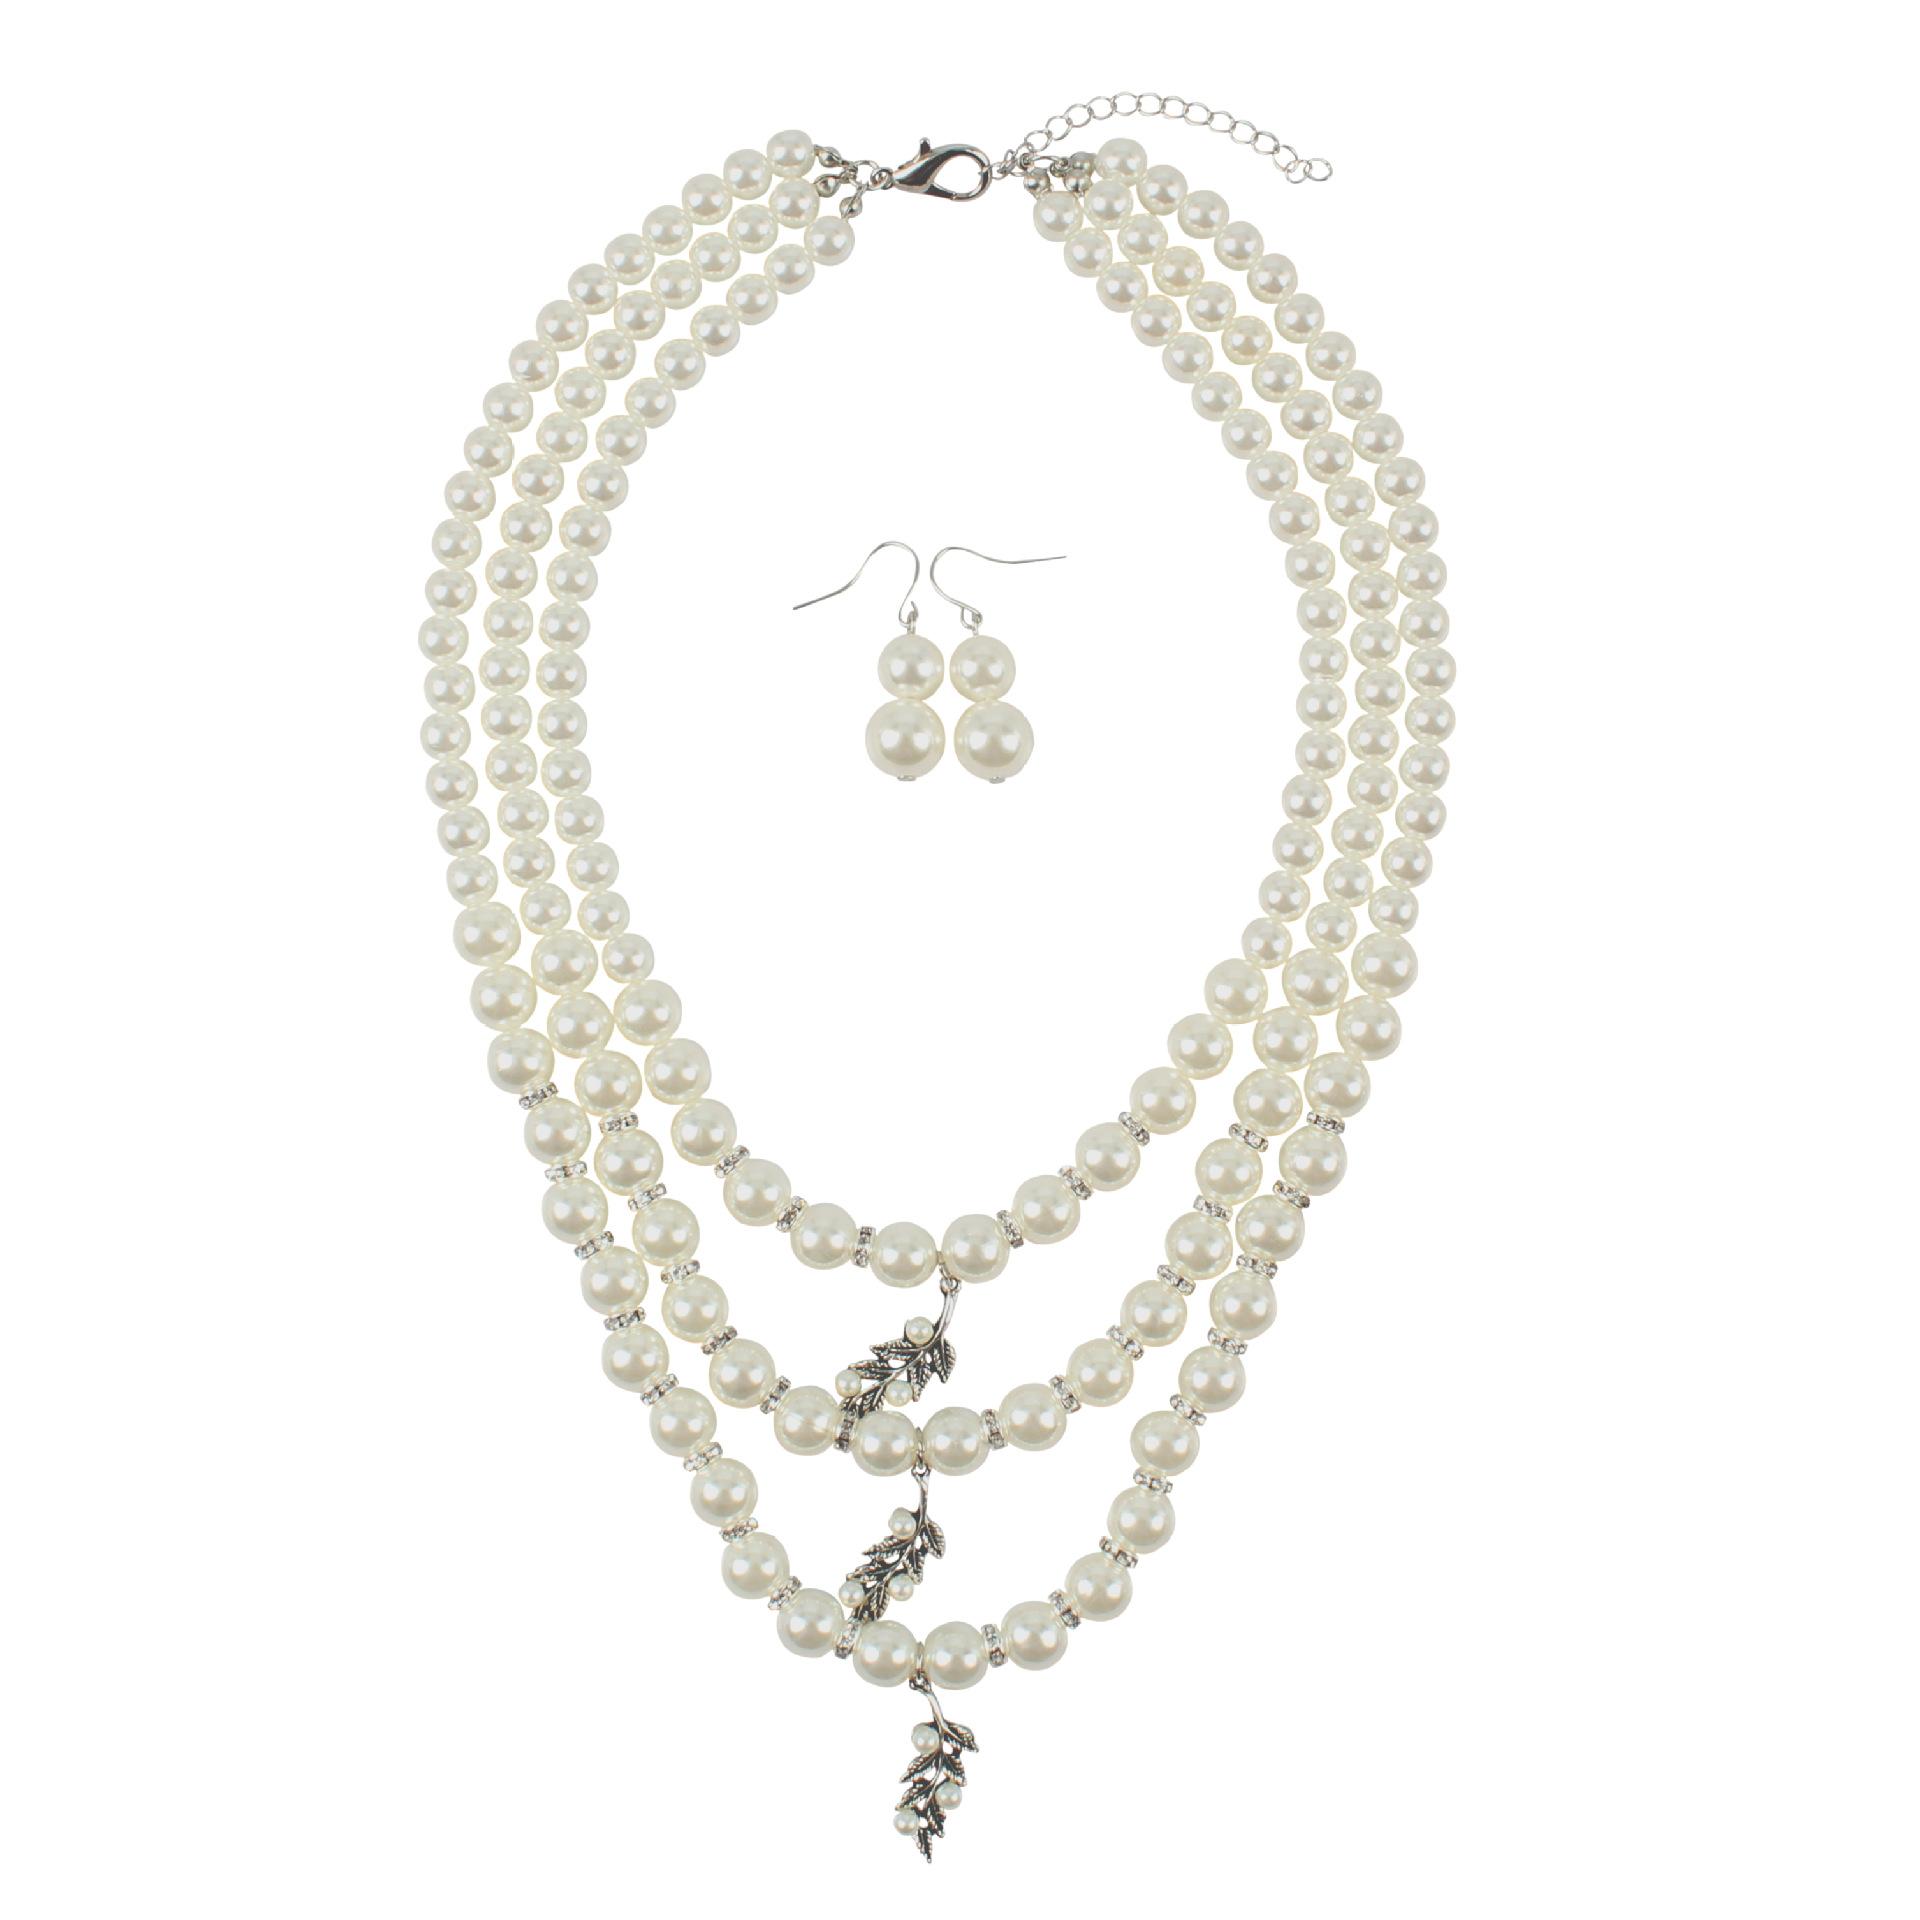 Beads Fashion Geometric necklace  creamywhite NHCT0346creamywhite